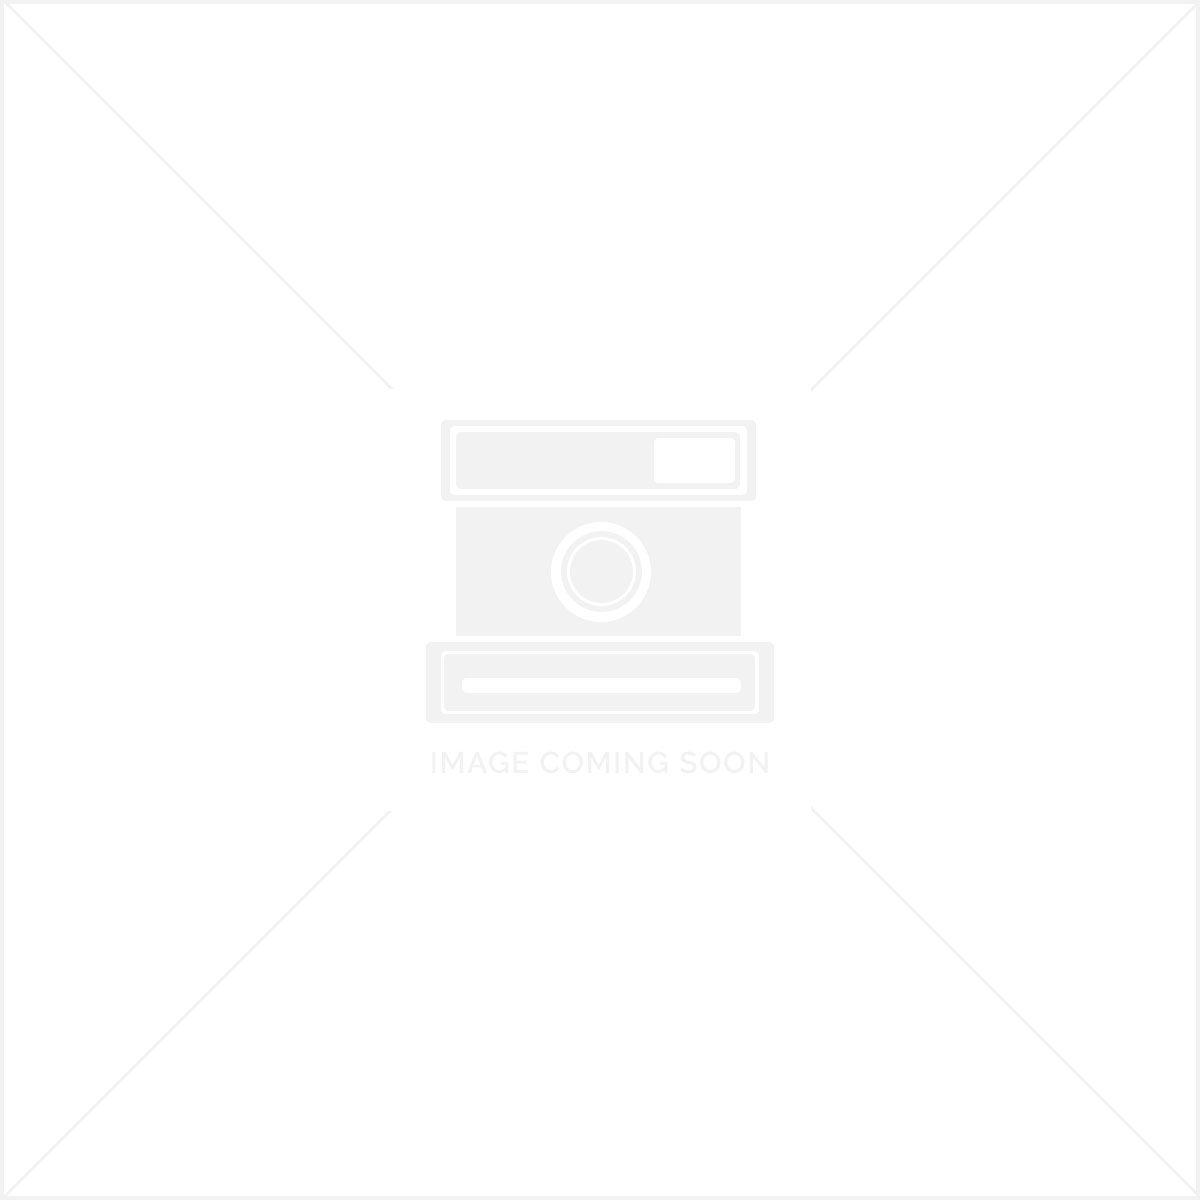 Strome Heavy weight Fabric 4 Fat Quarters Ancient Tartan - Craft Bundle